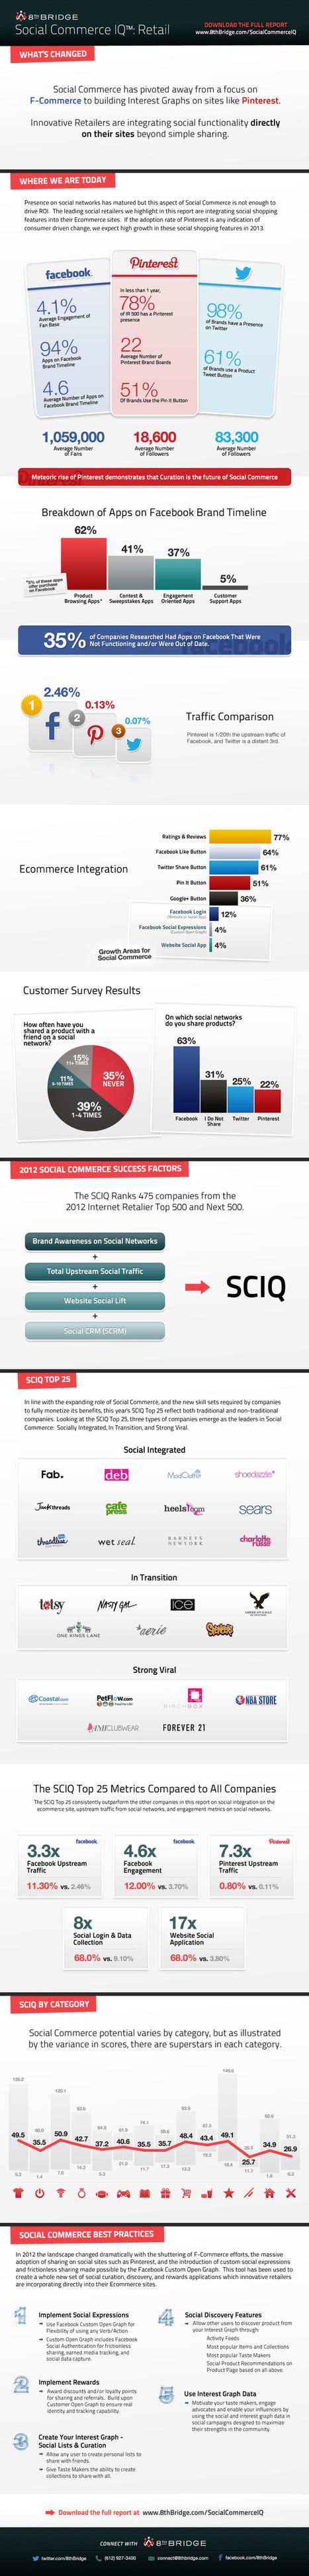 Social commerce best practices: infographic | BayPay Social Commerce | Scoop.it